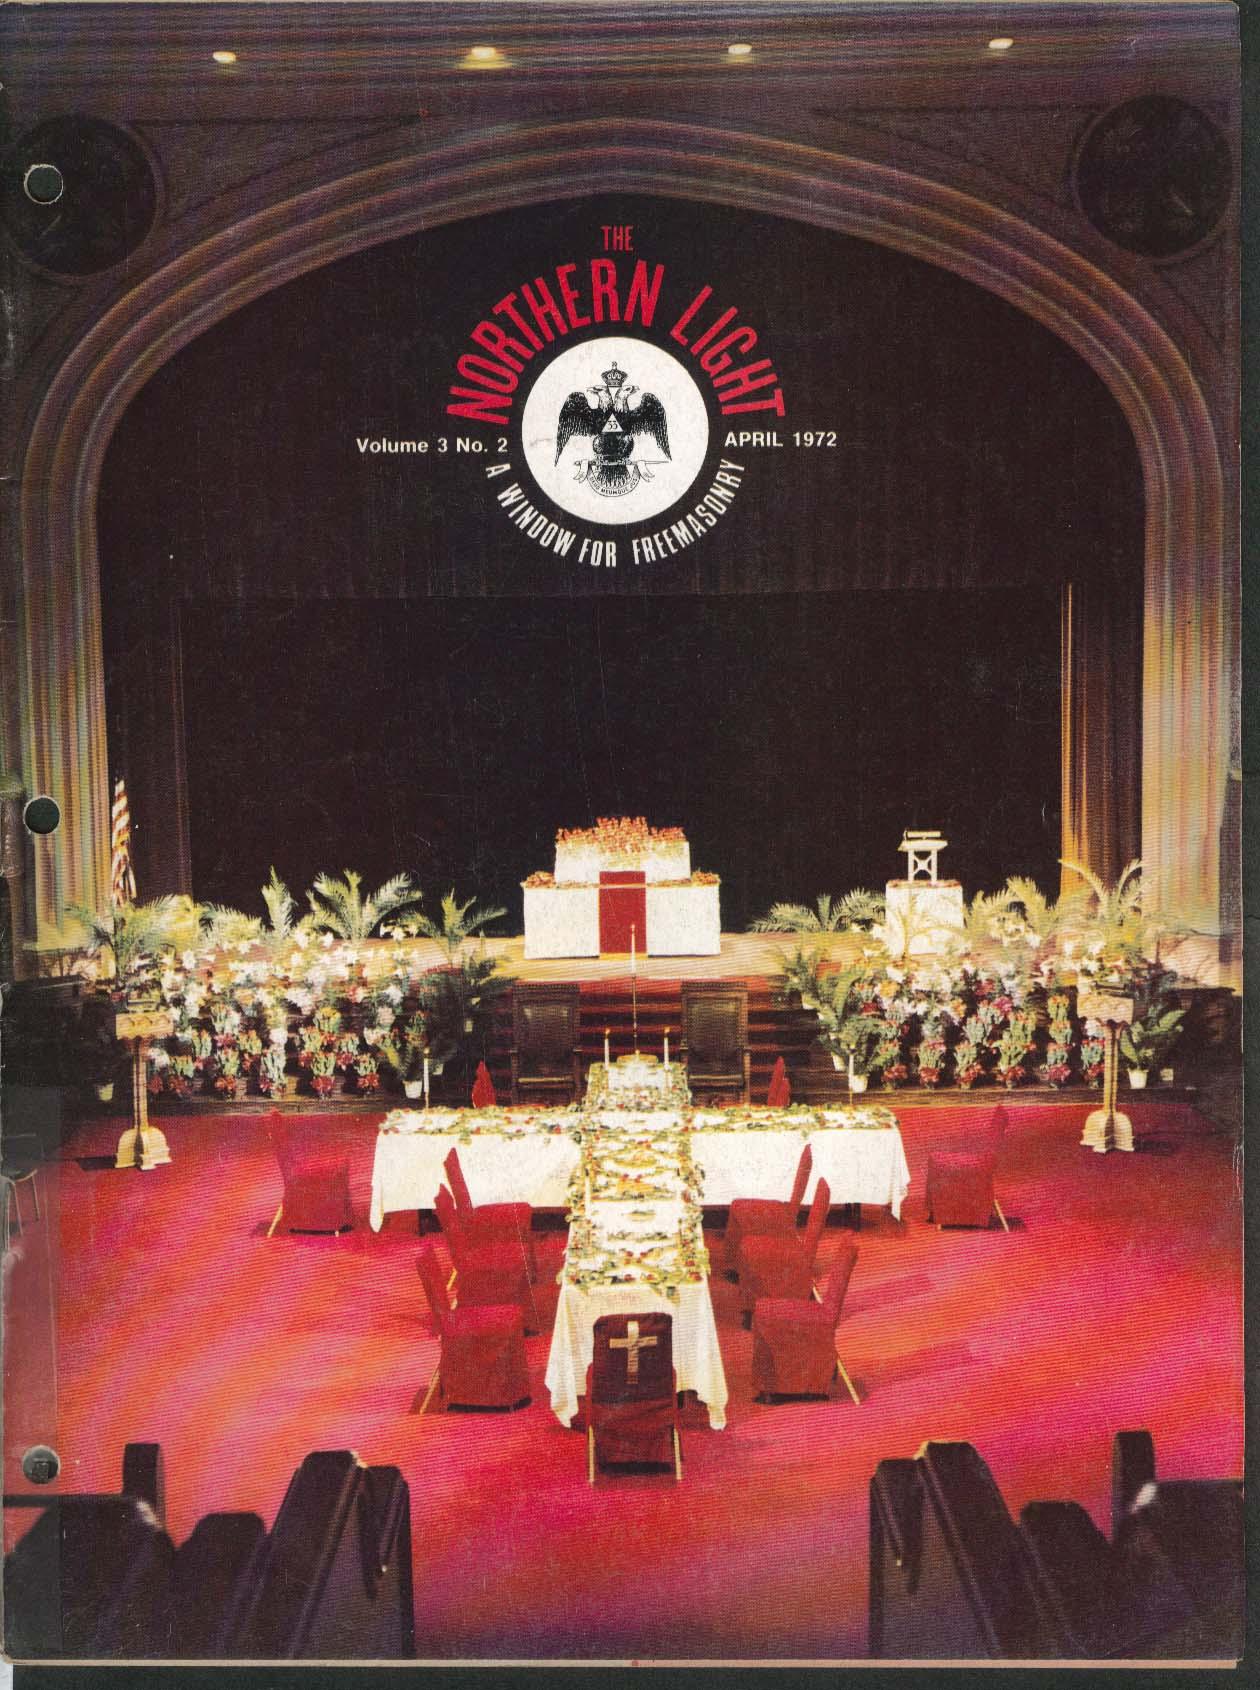 Image for NORTHERN LIGHT Vol 3 #2 Paschal Lamb Jenkintown George Burow 4 1972